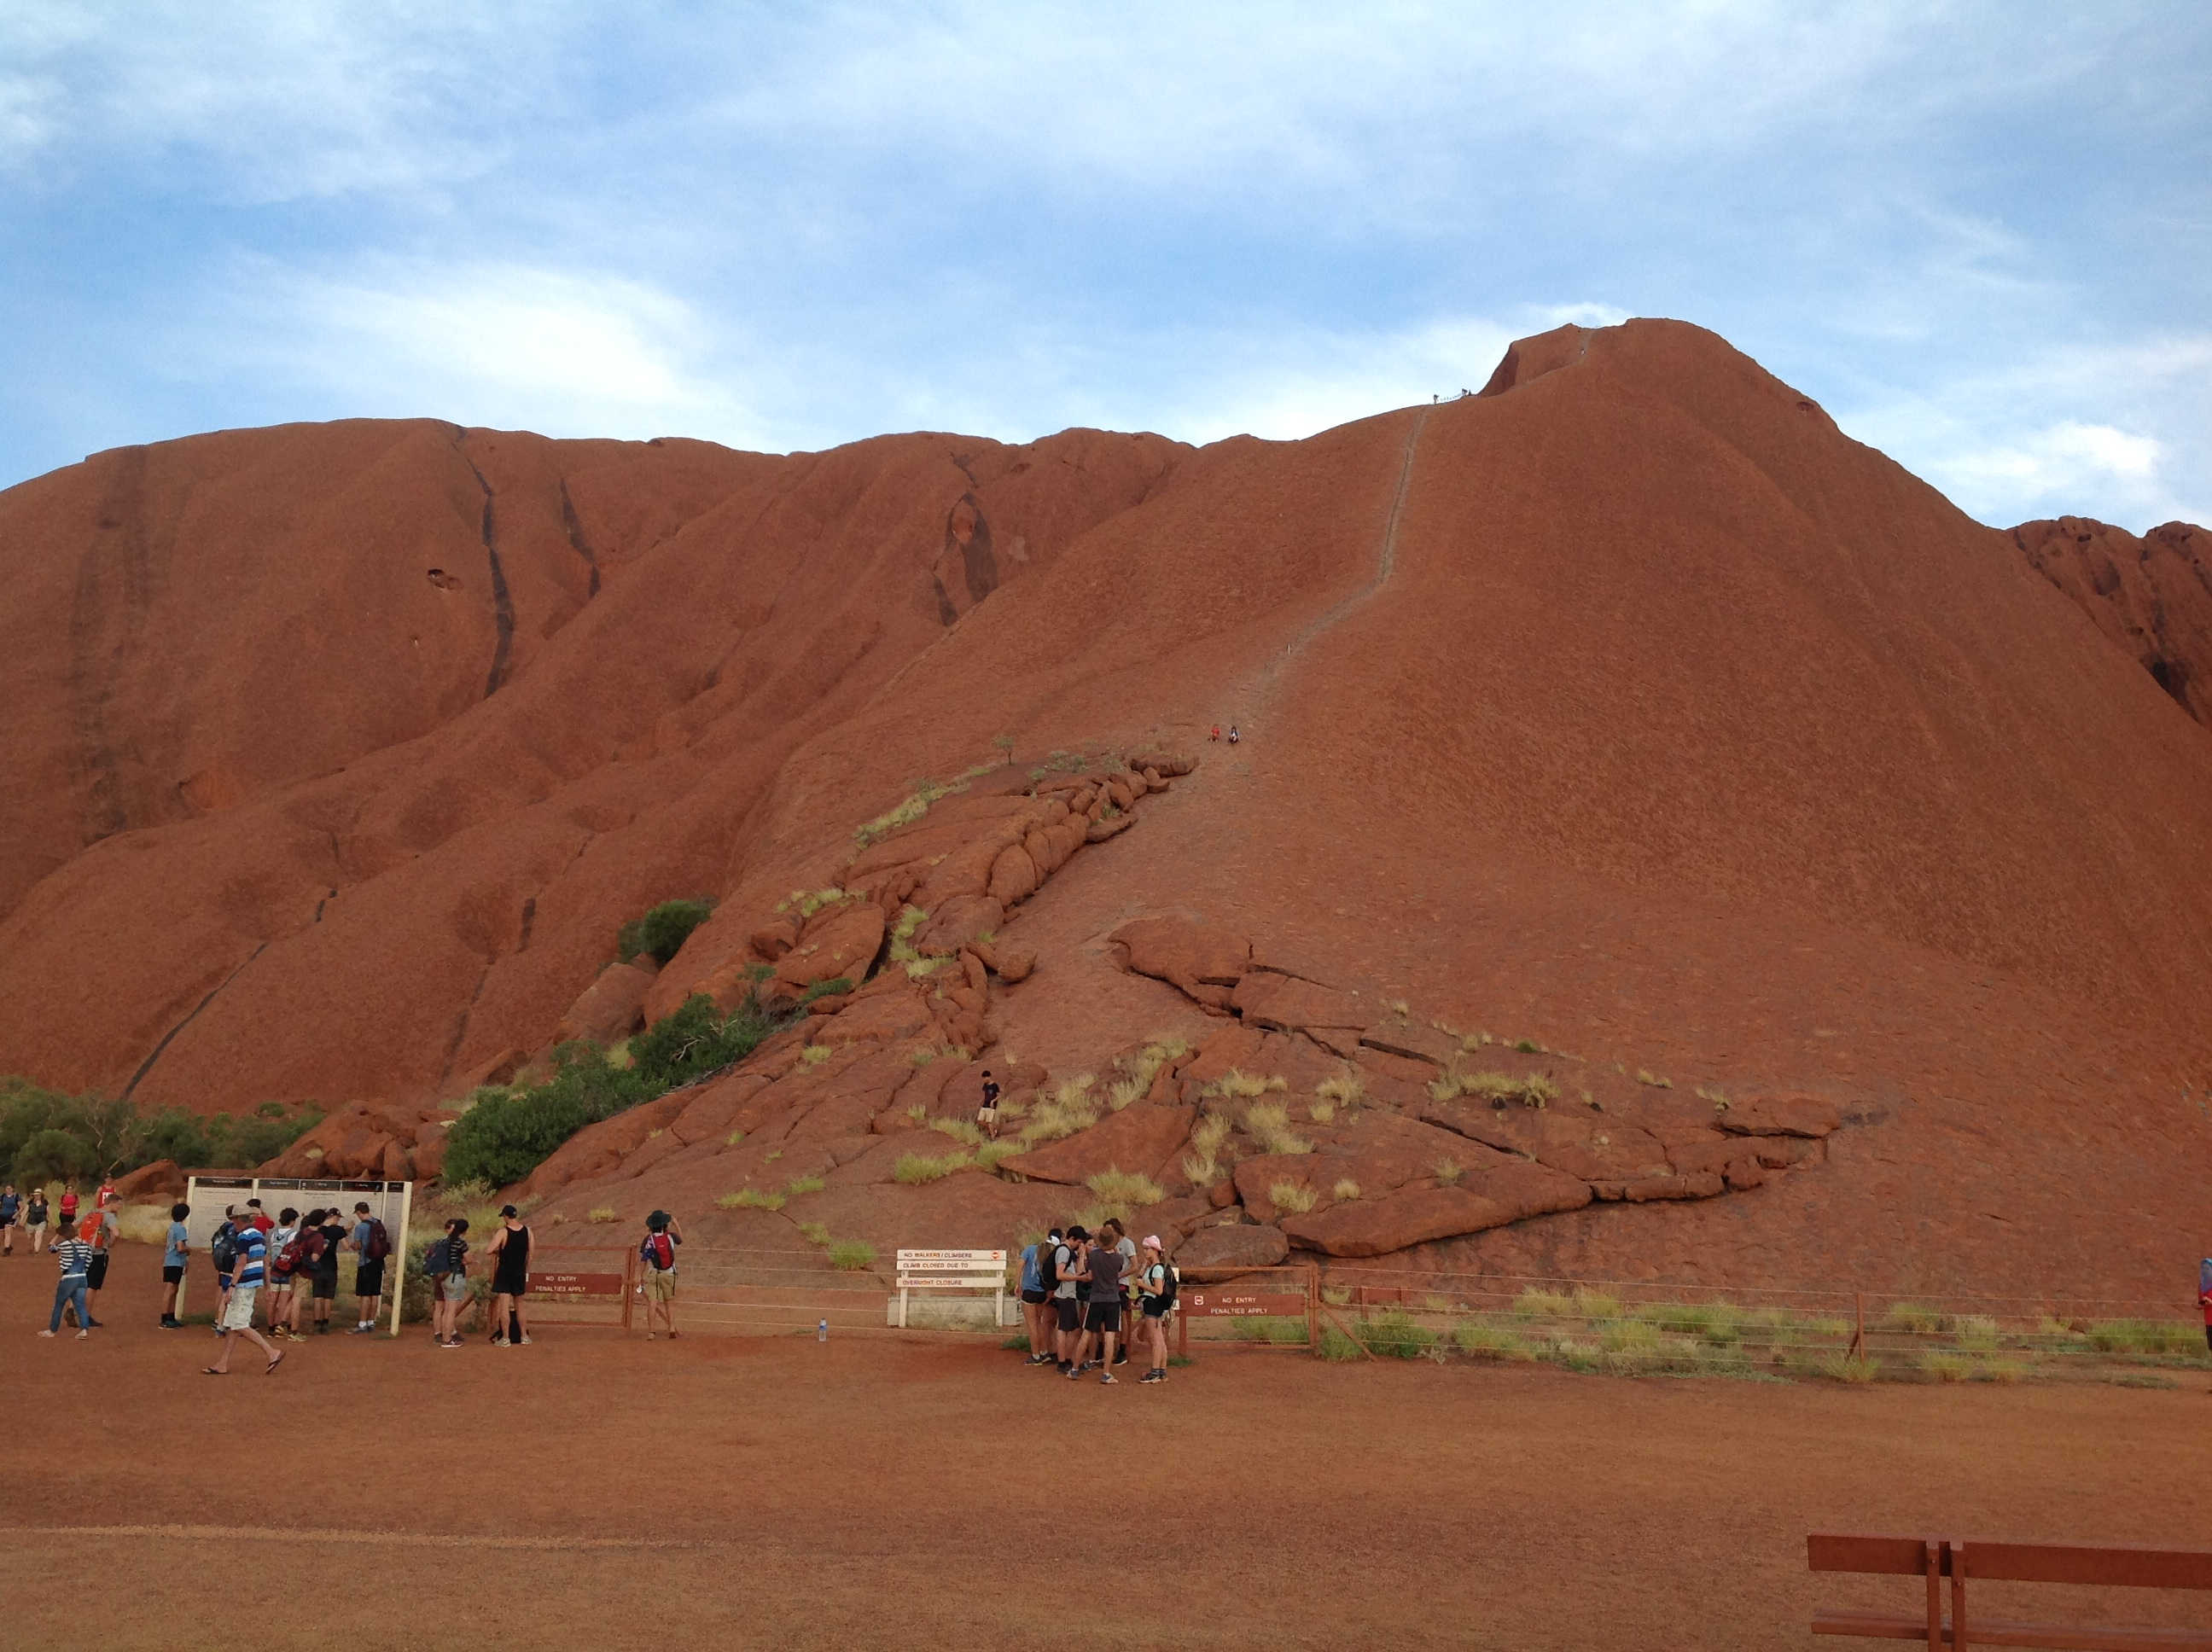 The Uluru-Kata Tjuta National Park, an UNESCO World ... |Uluru Kata Tjuta National Park Australia